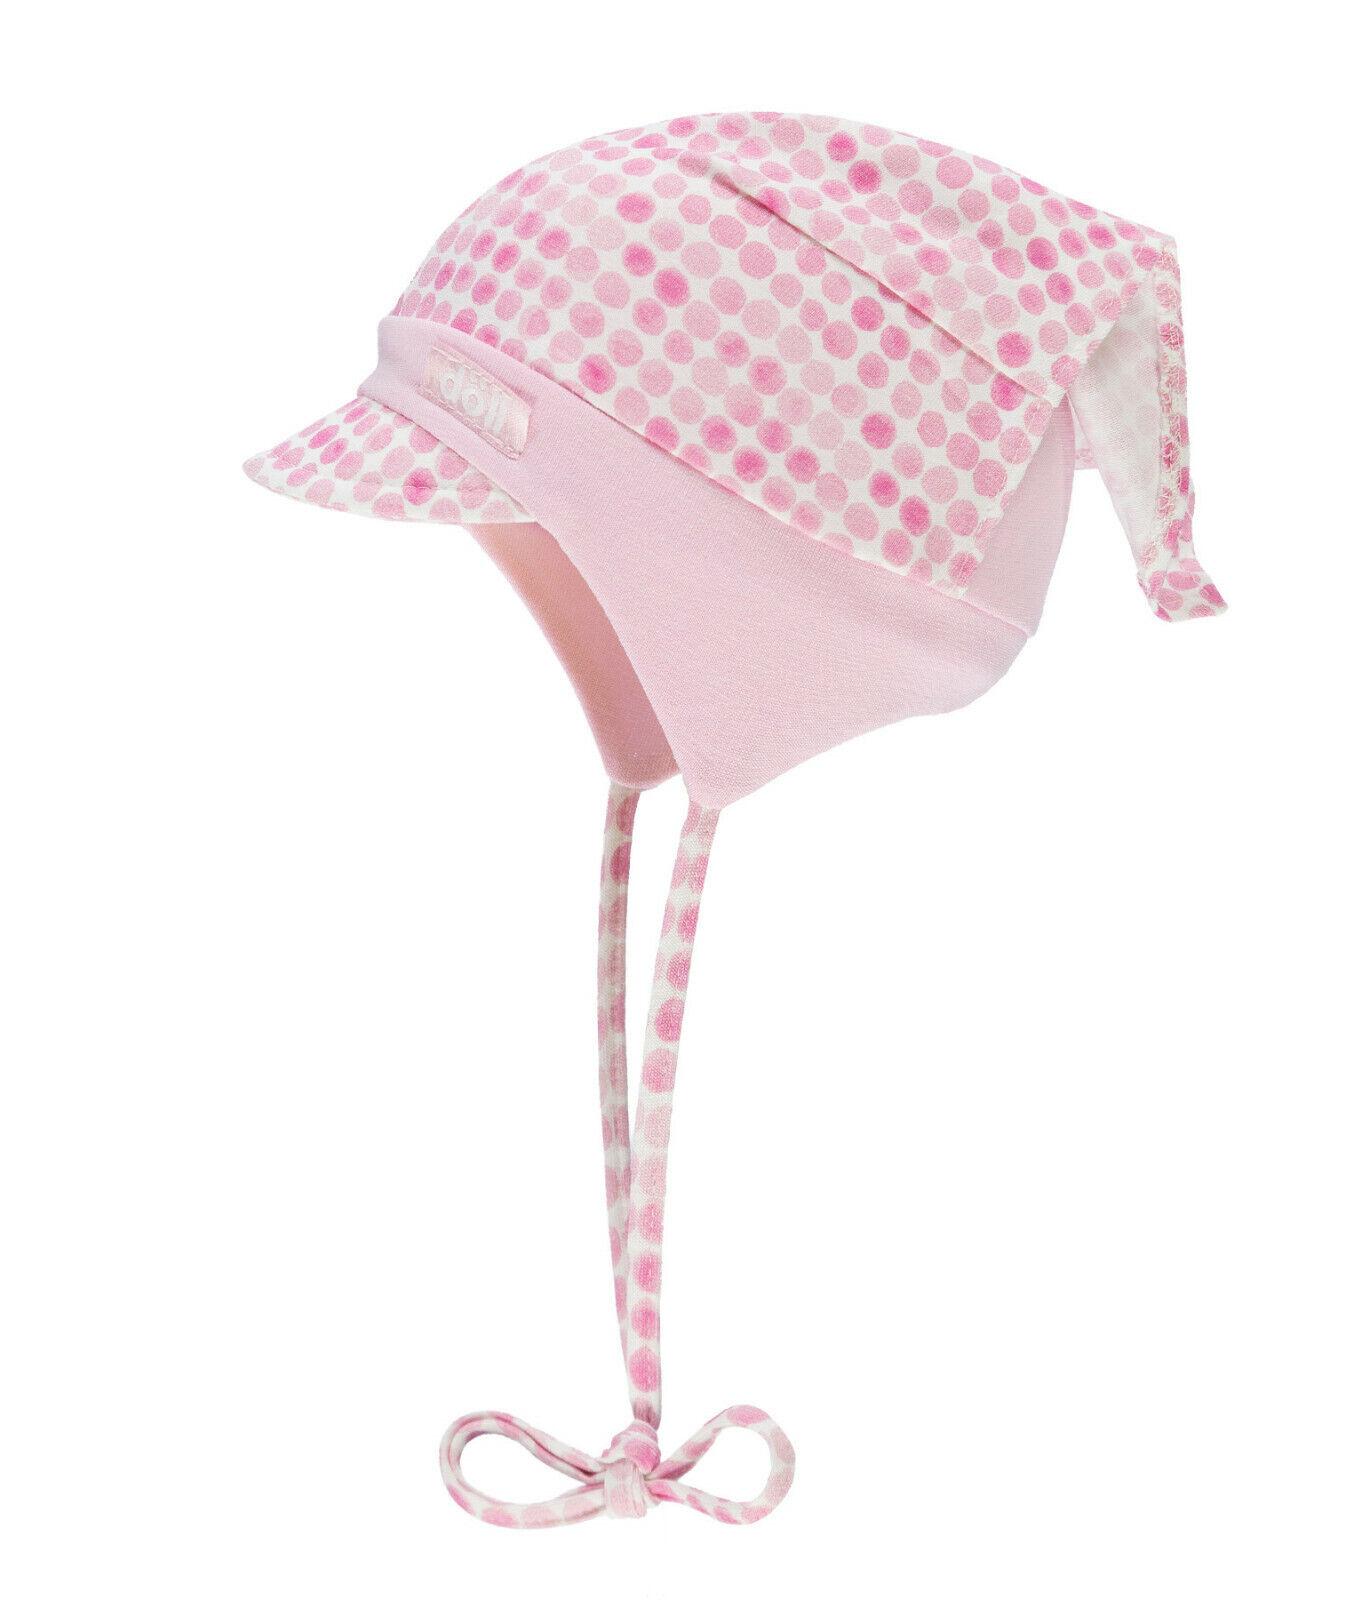 Döll Mütze Kopftuch Mädchen Baby Sonnenhut Sonnenschutz UV Schutz 50+ NEU